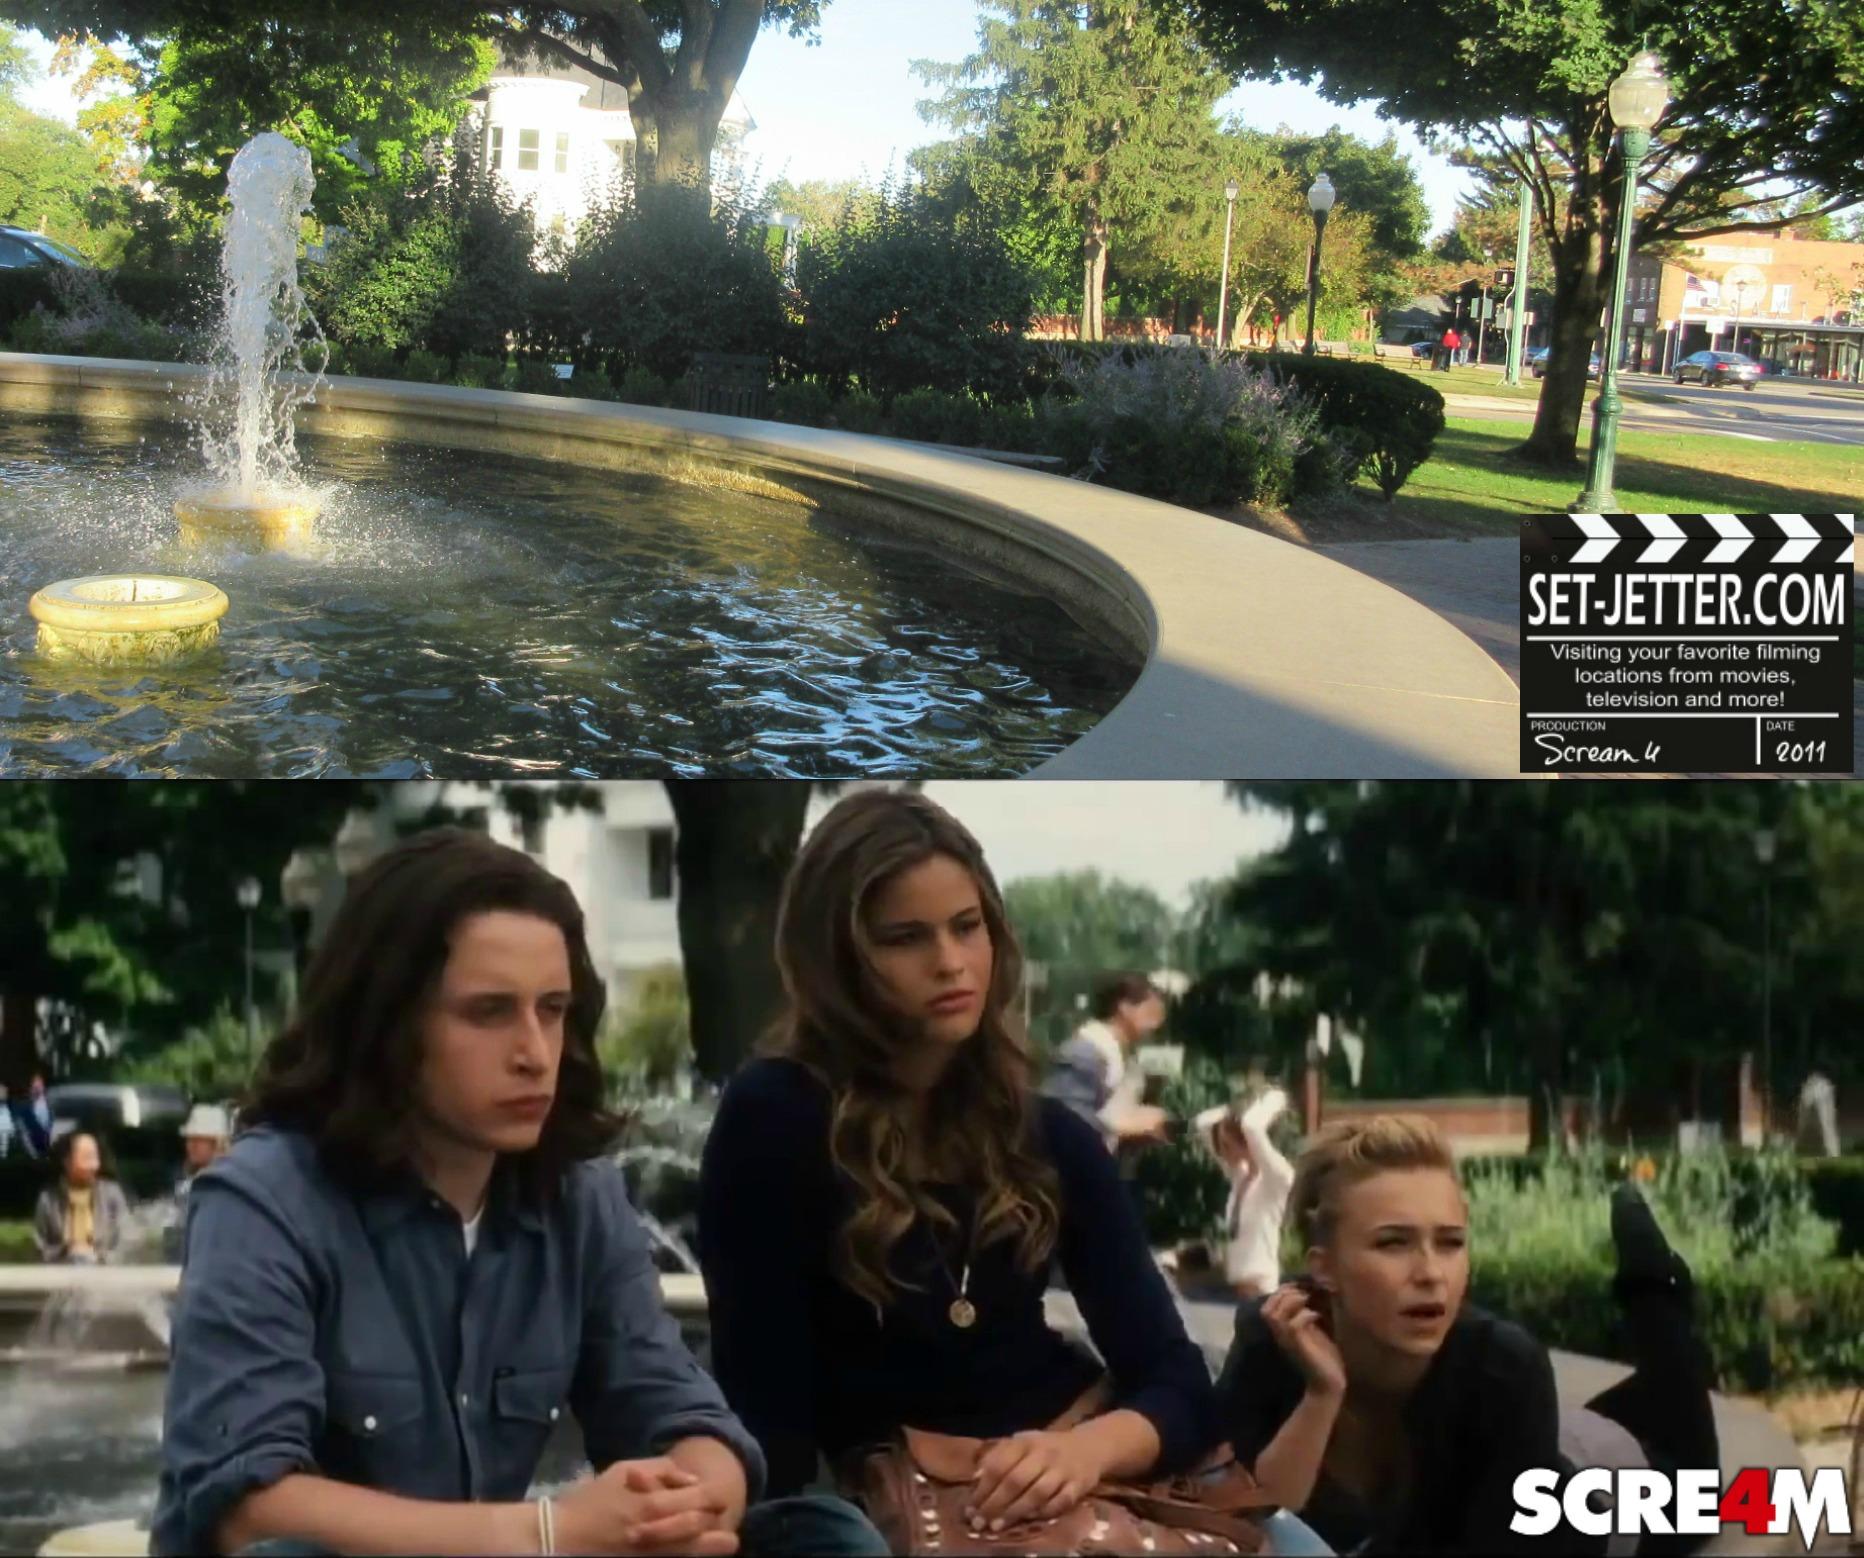 Scream4 comparison 158.jpg